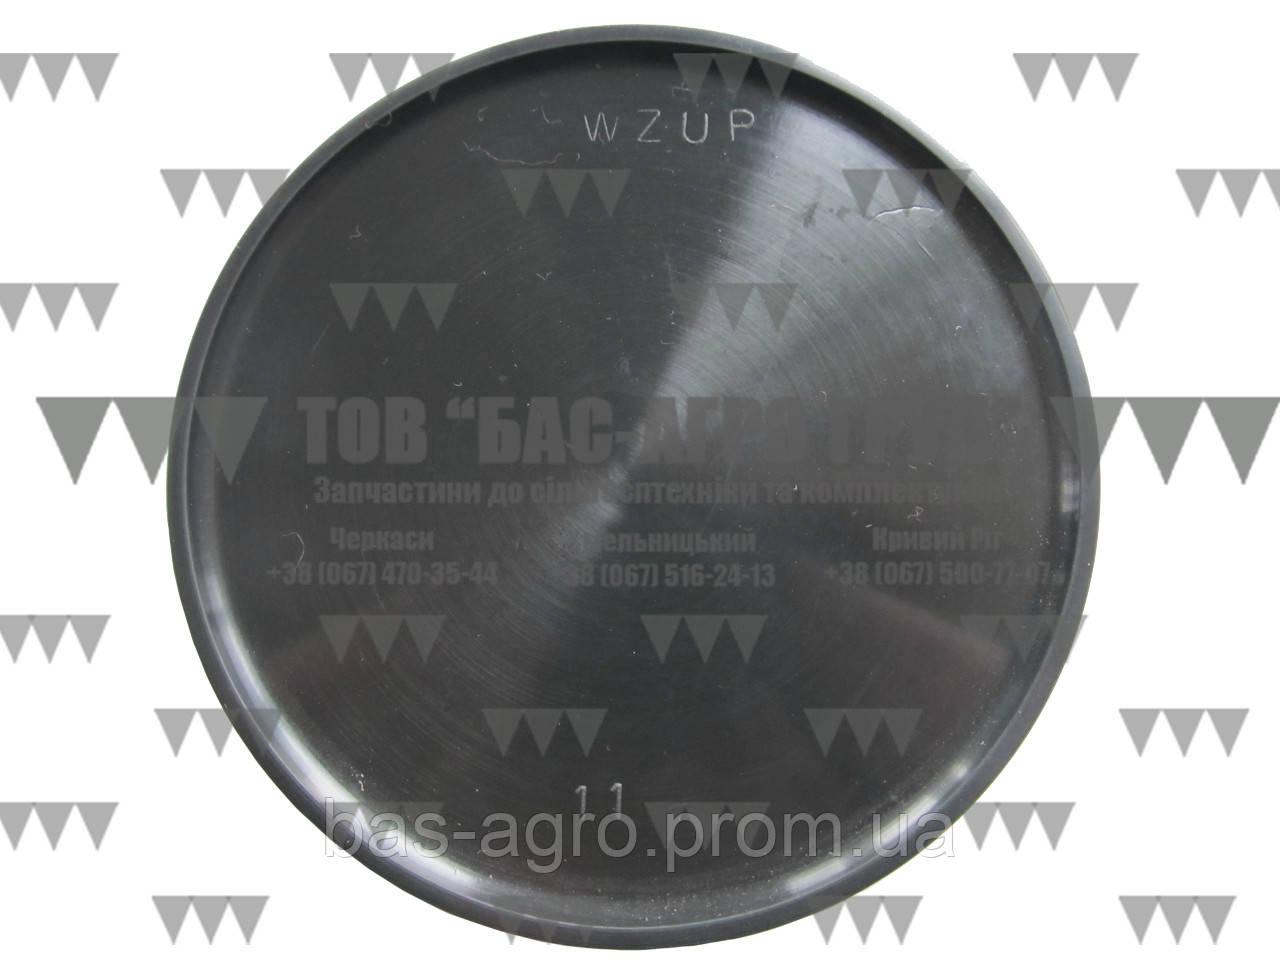 Мембрана насоса боковая 128 мм тип 11